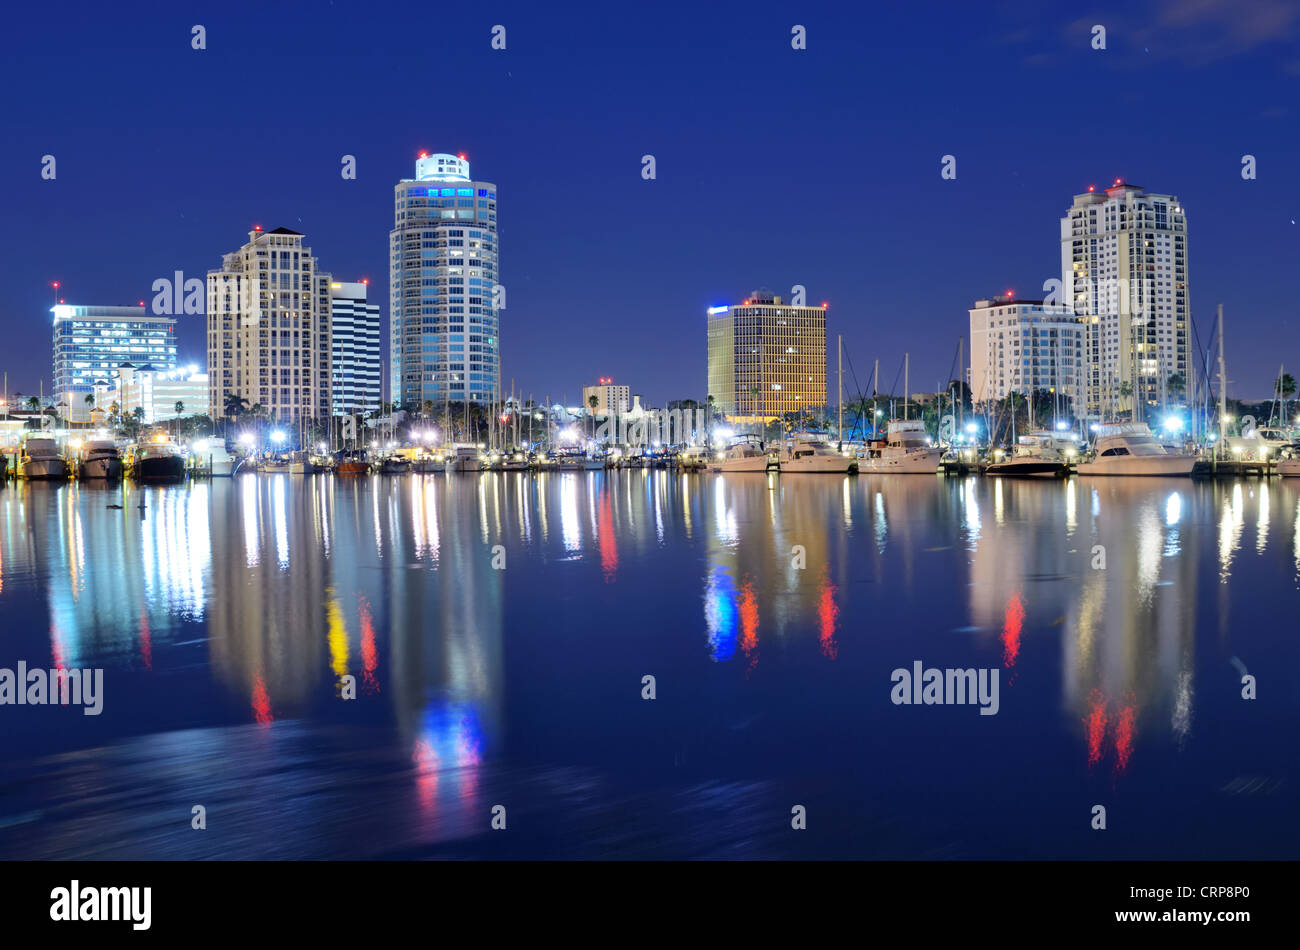 Skyline of St. Petersburg, Florida - Stock Image